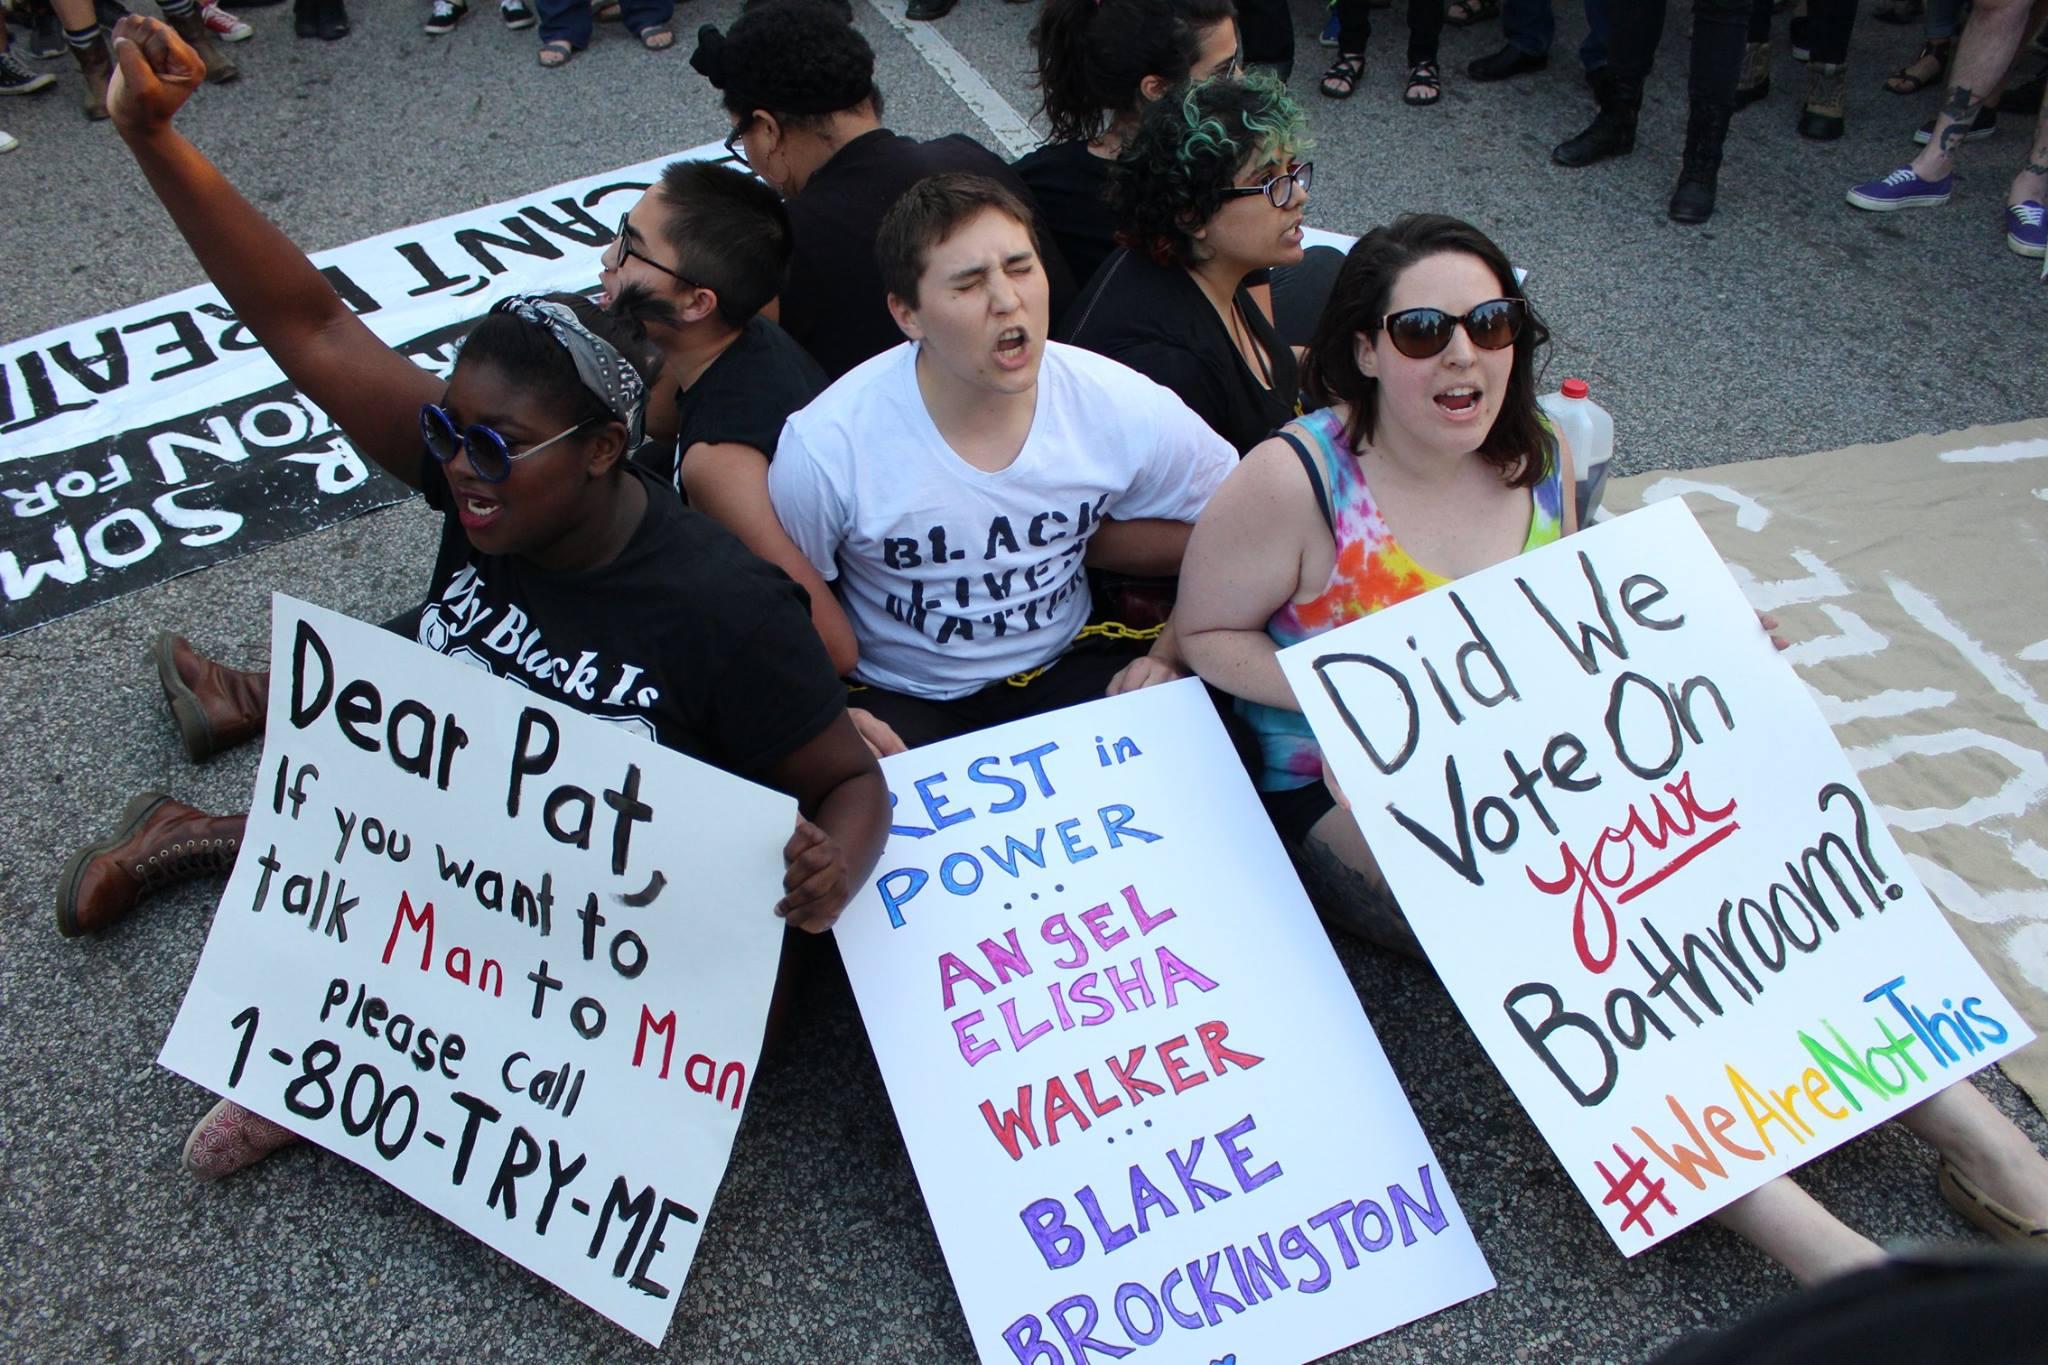 Continued united fightback galvanizes North Carolina   Liberation News